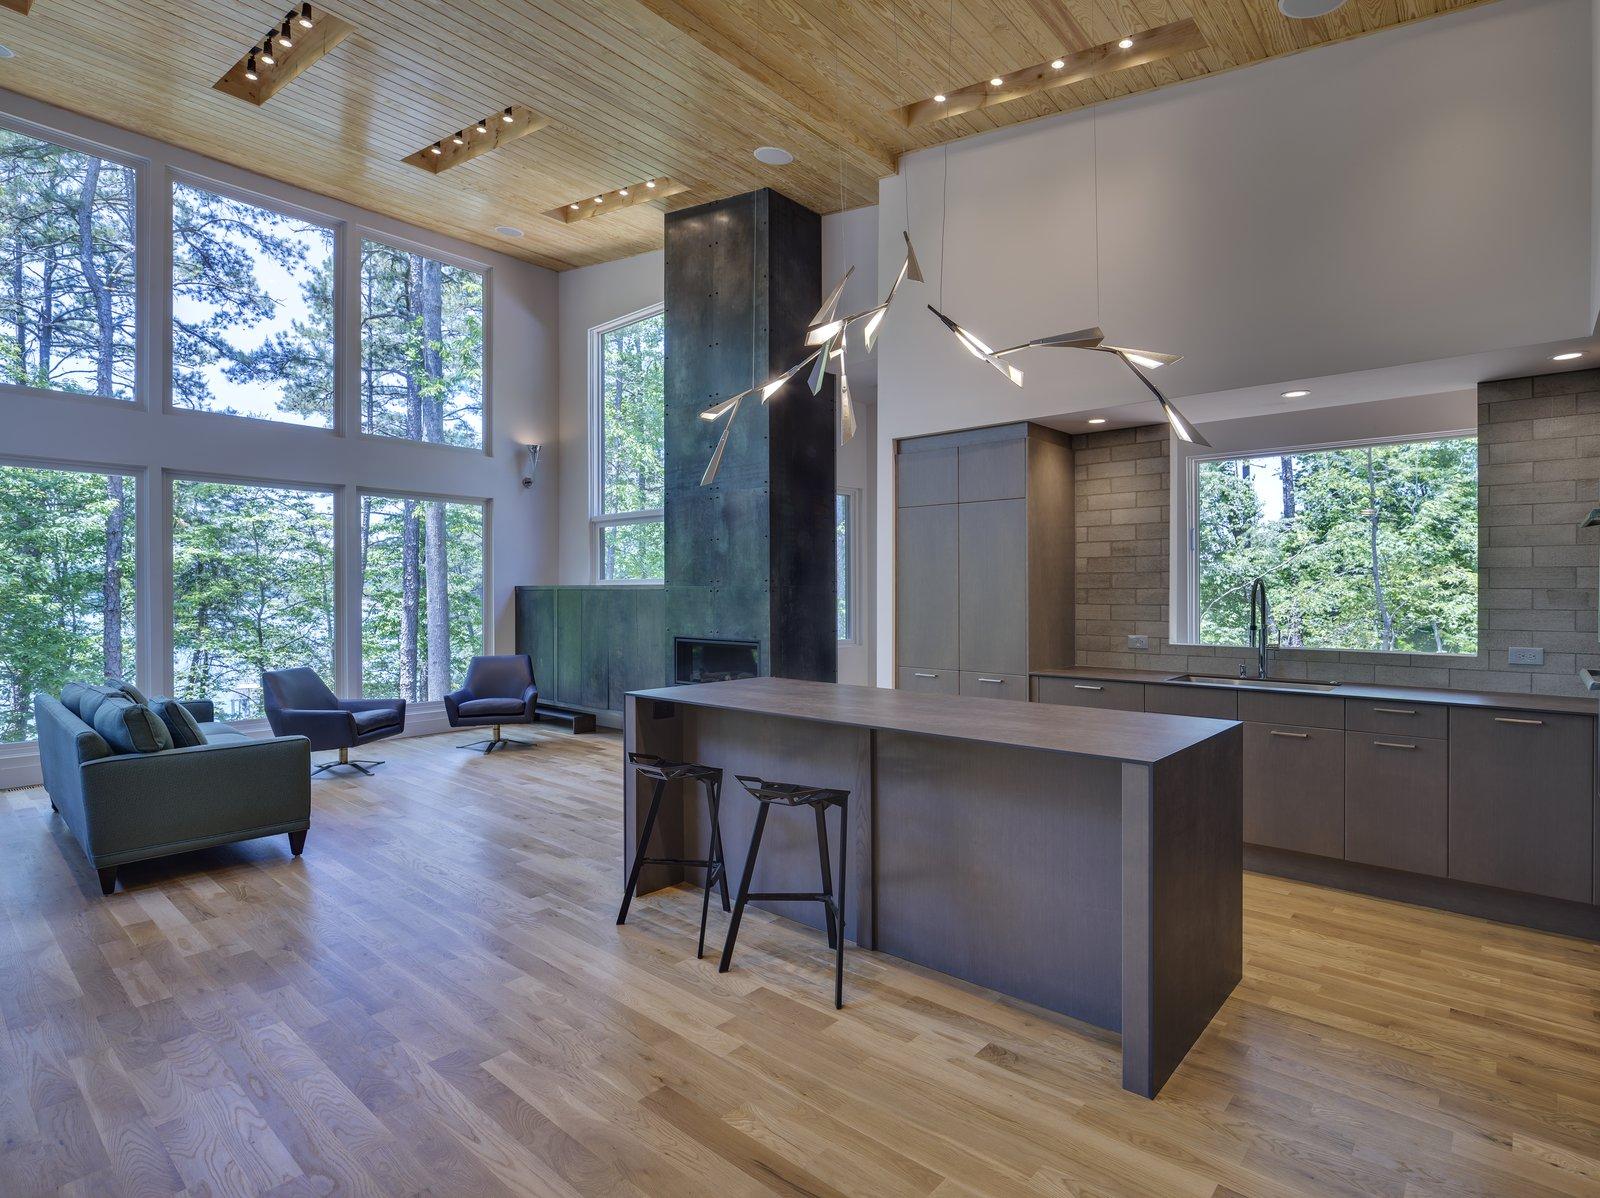 Lake House by TaC studios